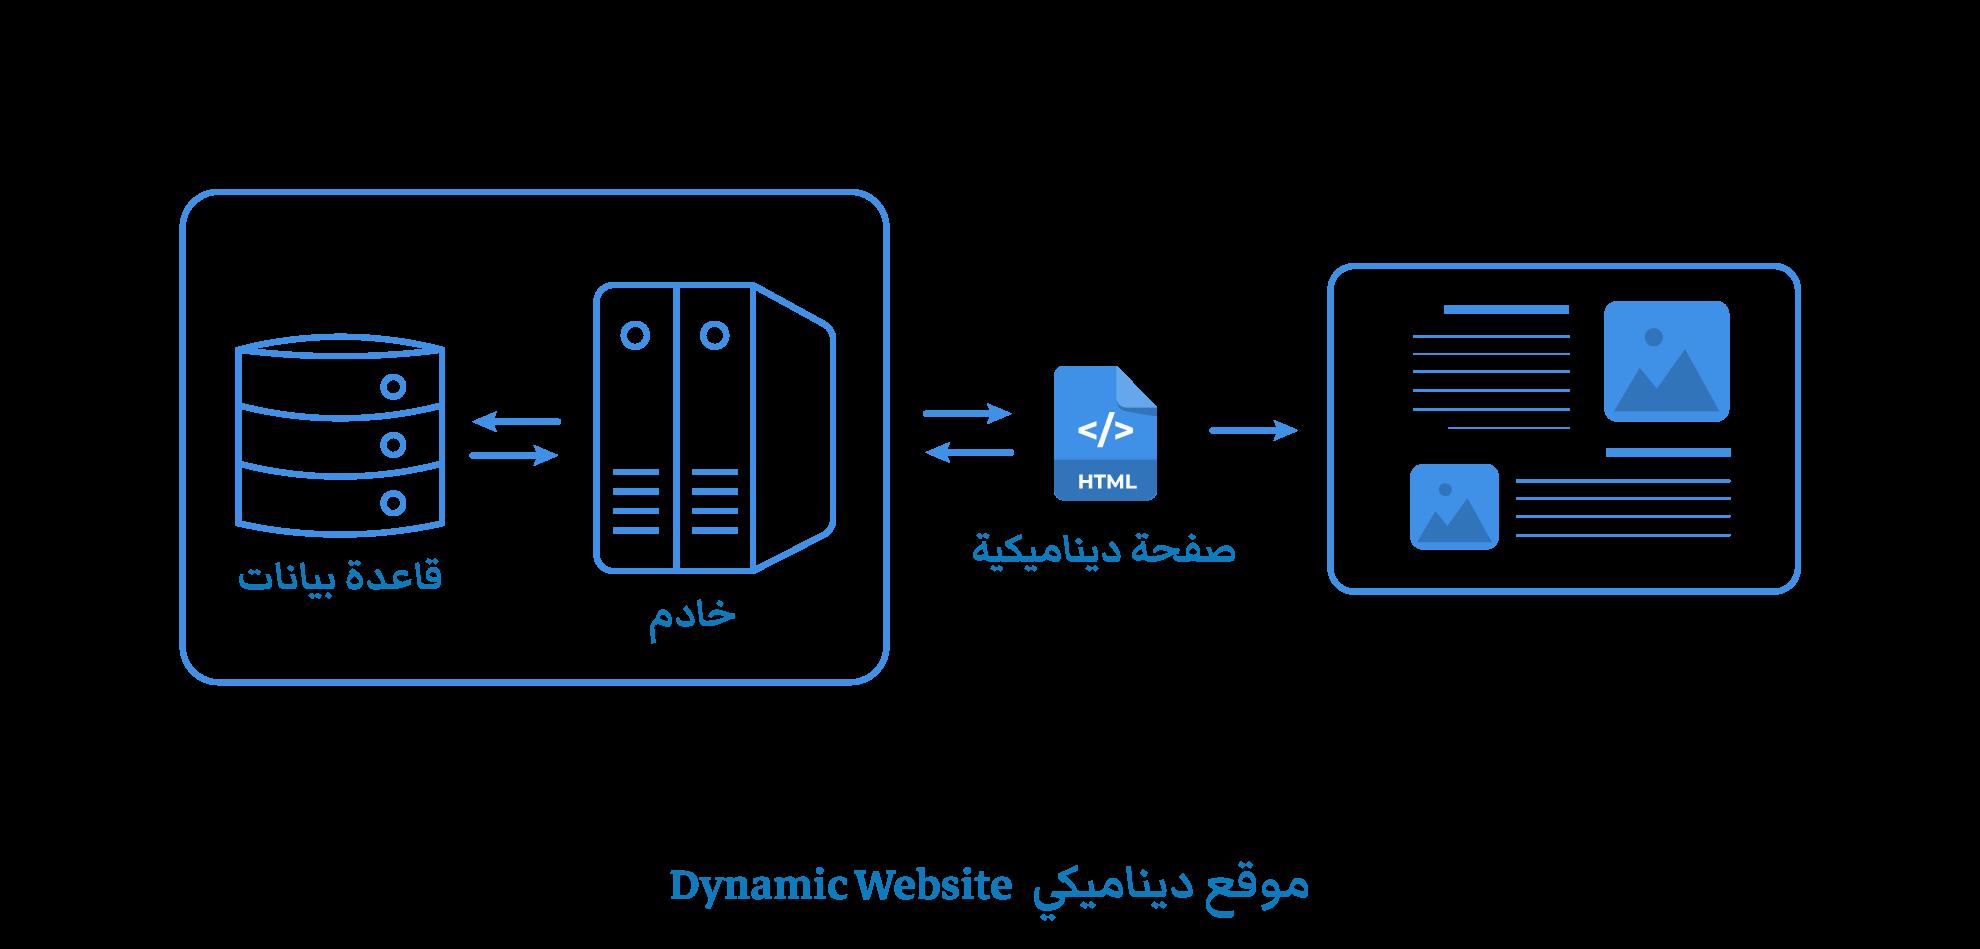 dynamicweb.png